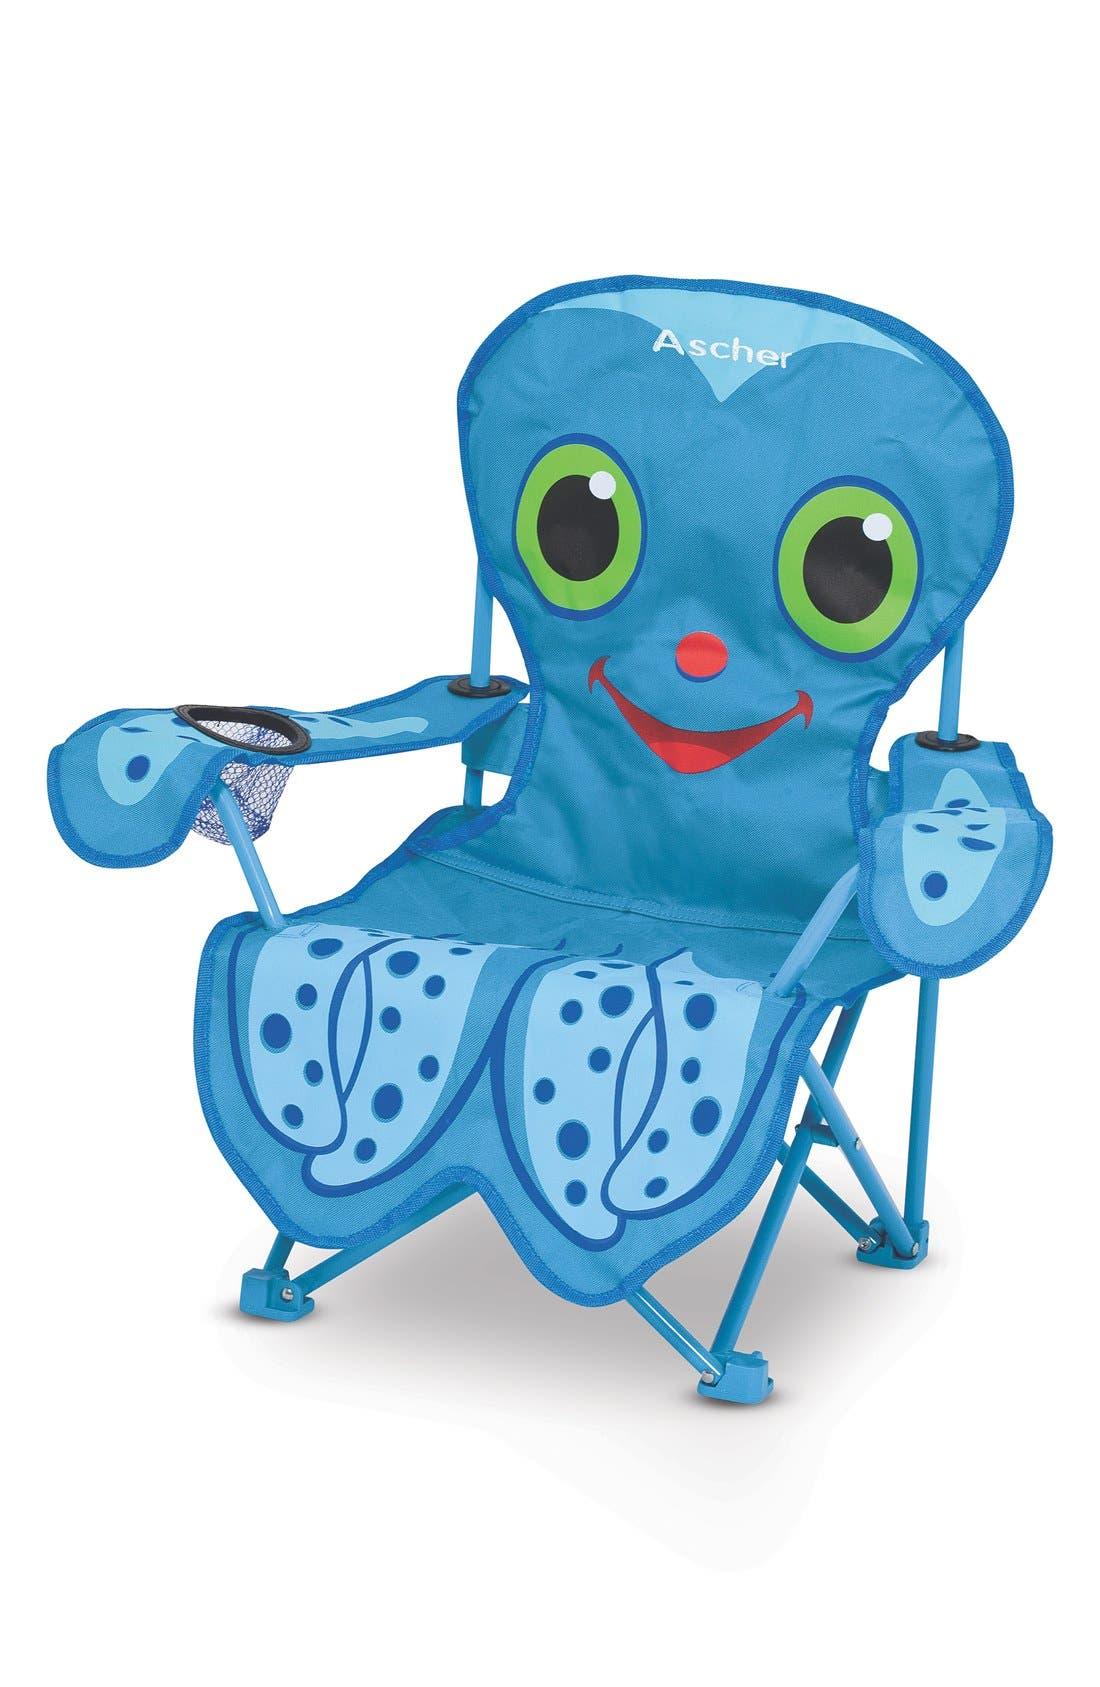 'Flex Octopus' Personalized Folding Chair,                             Main thumbnail 1, color,                             400